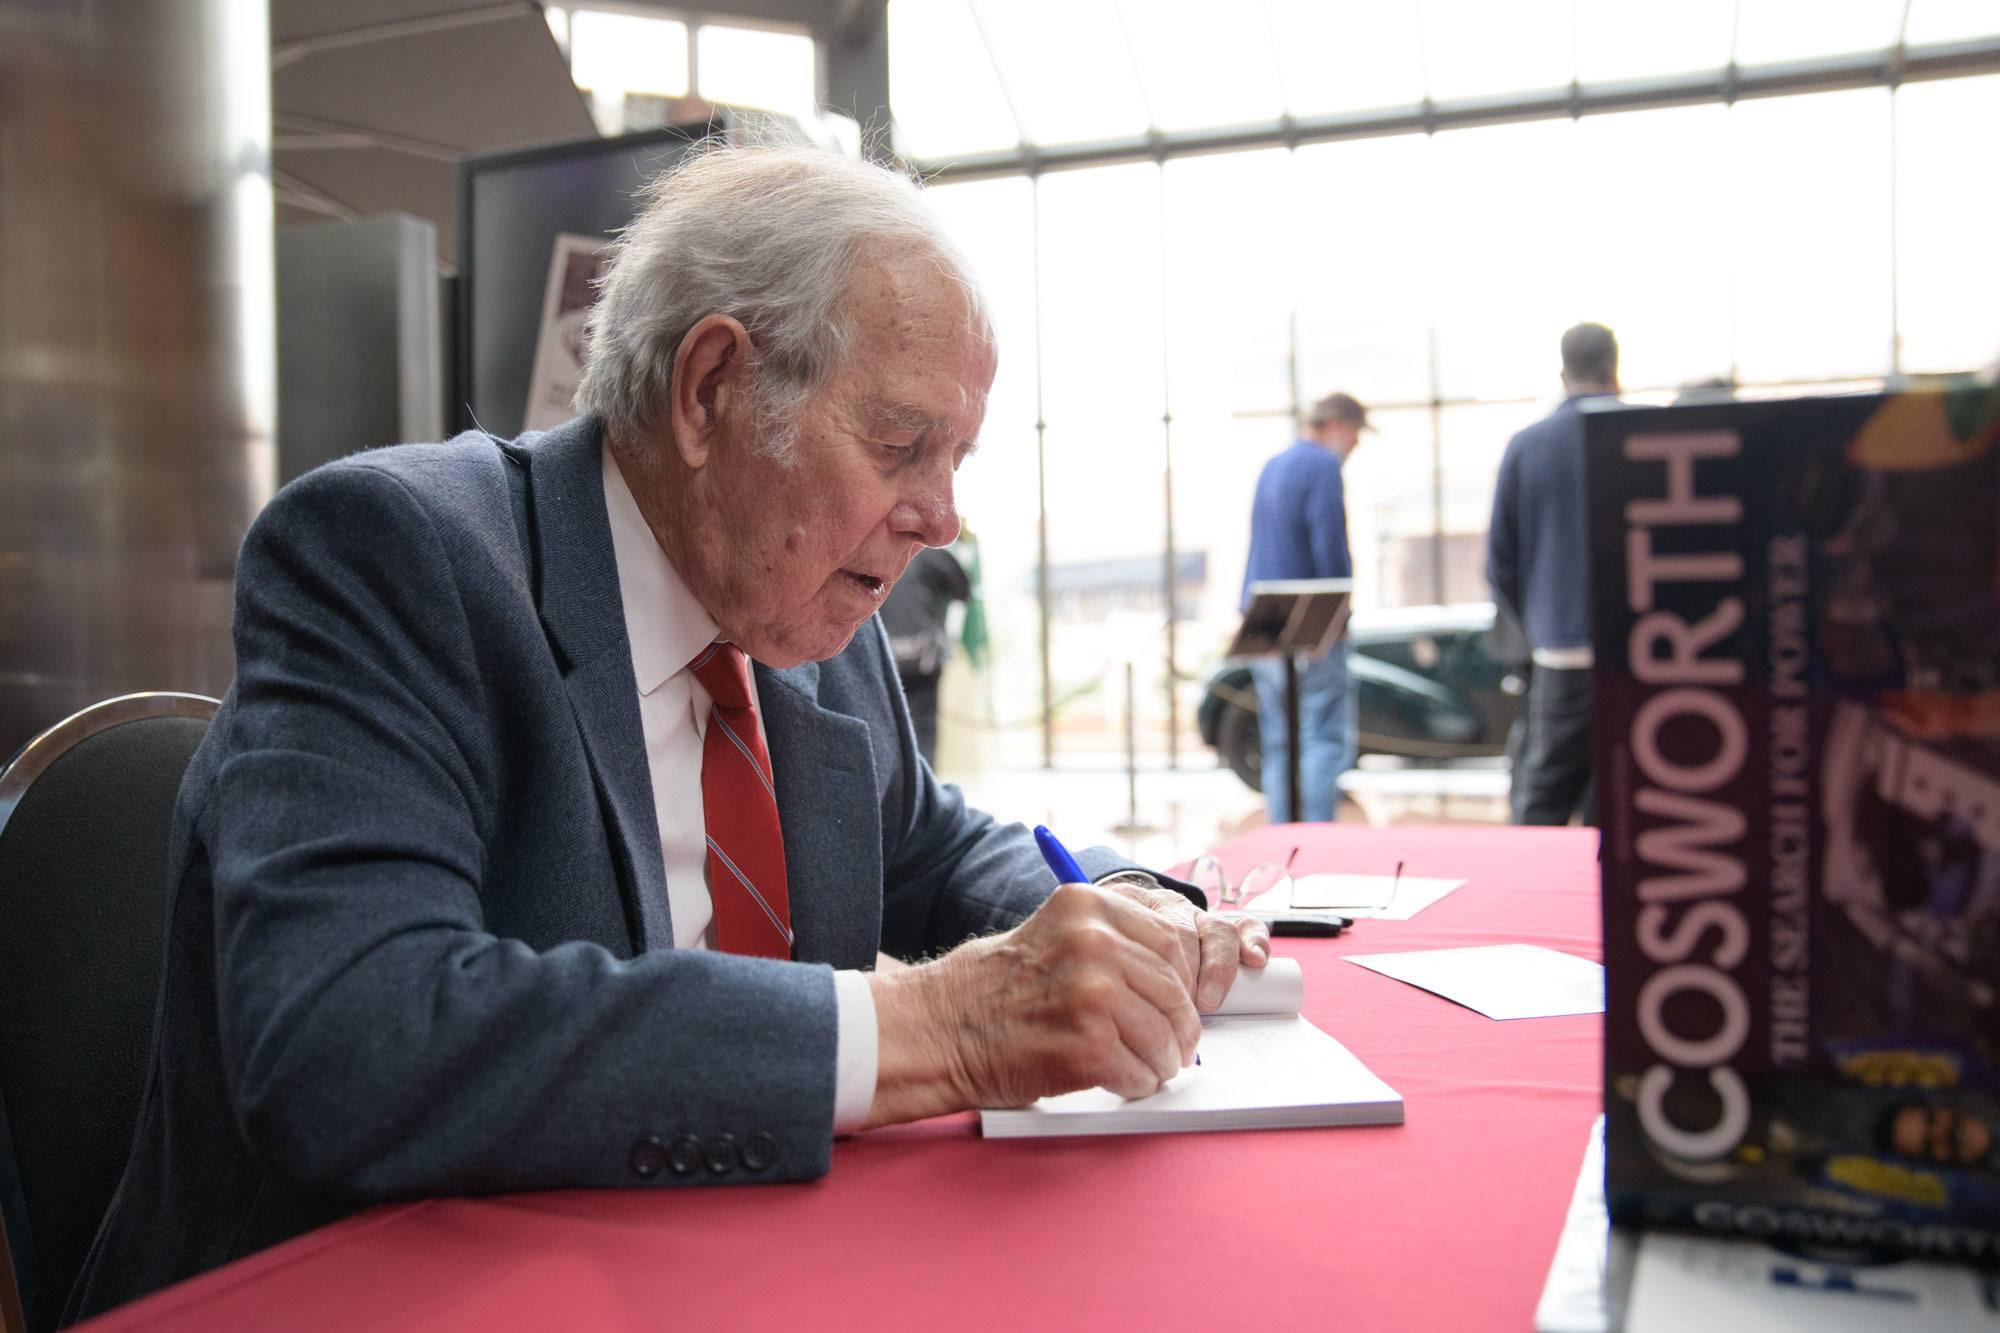 Graham Robson